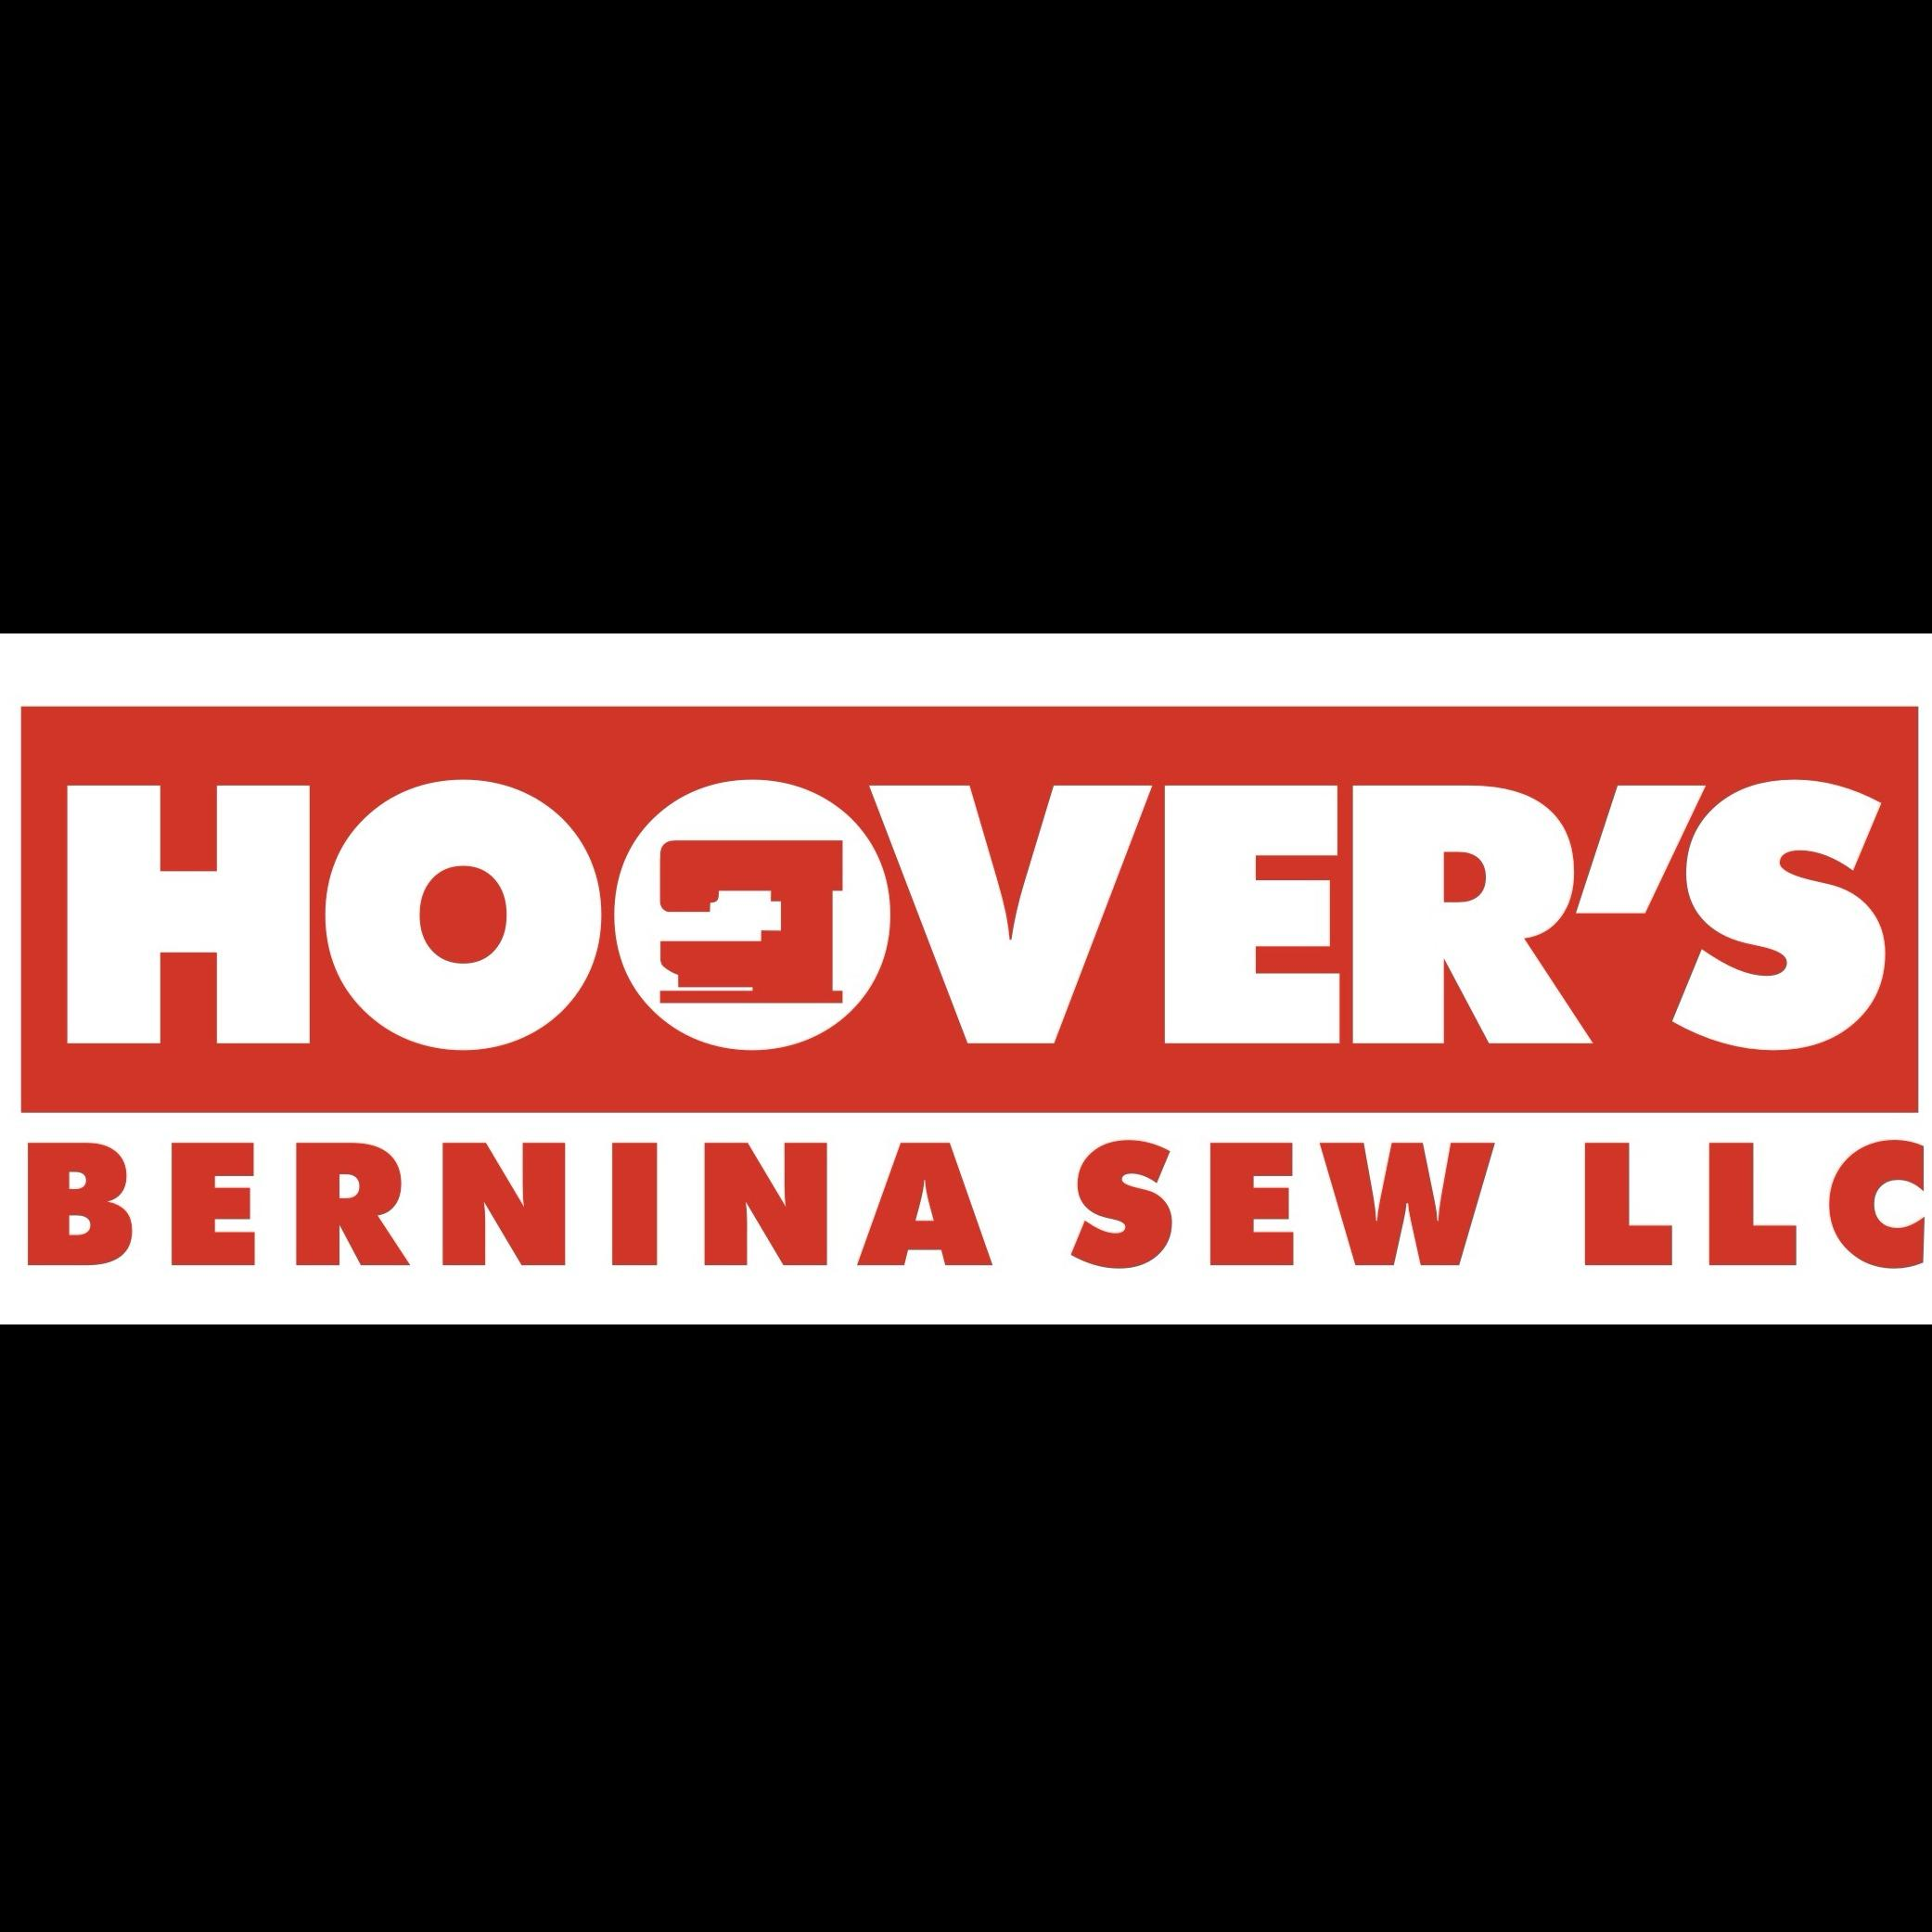 Hoover's Bernina Sew